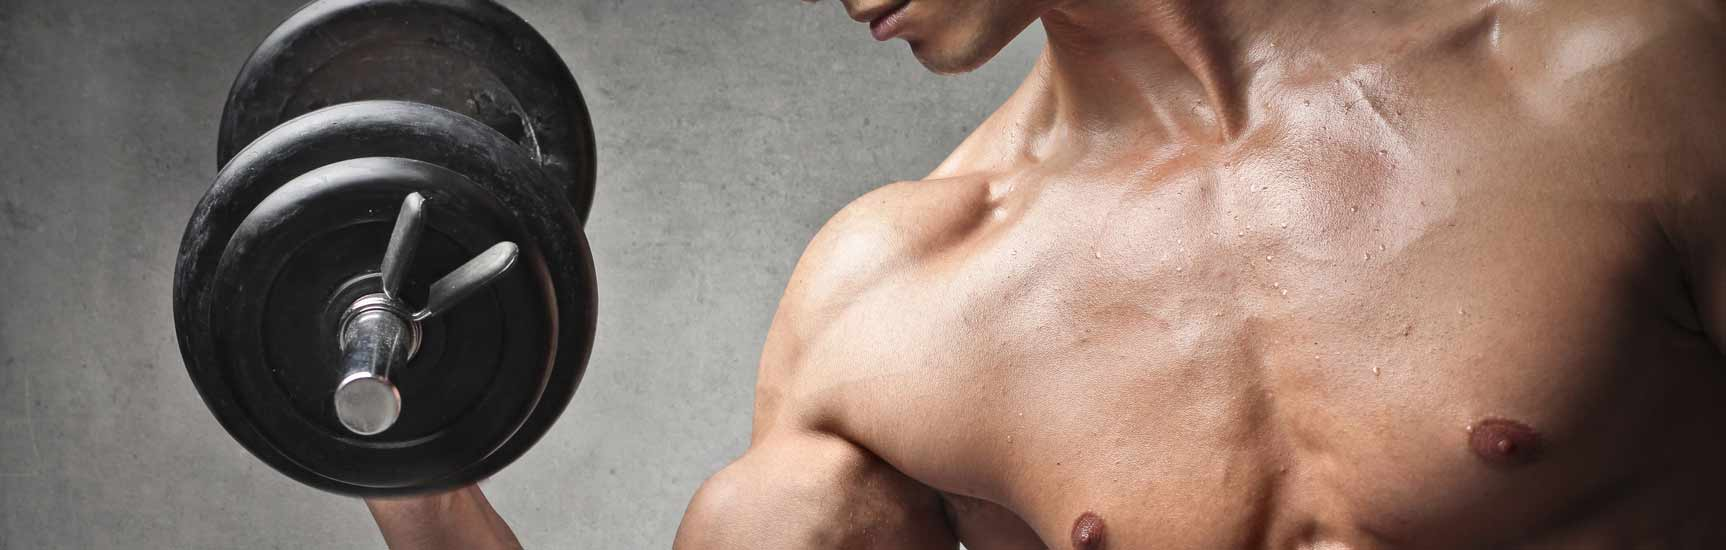 Anabolizantes naturais aumentam testosterona e massa muscular?